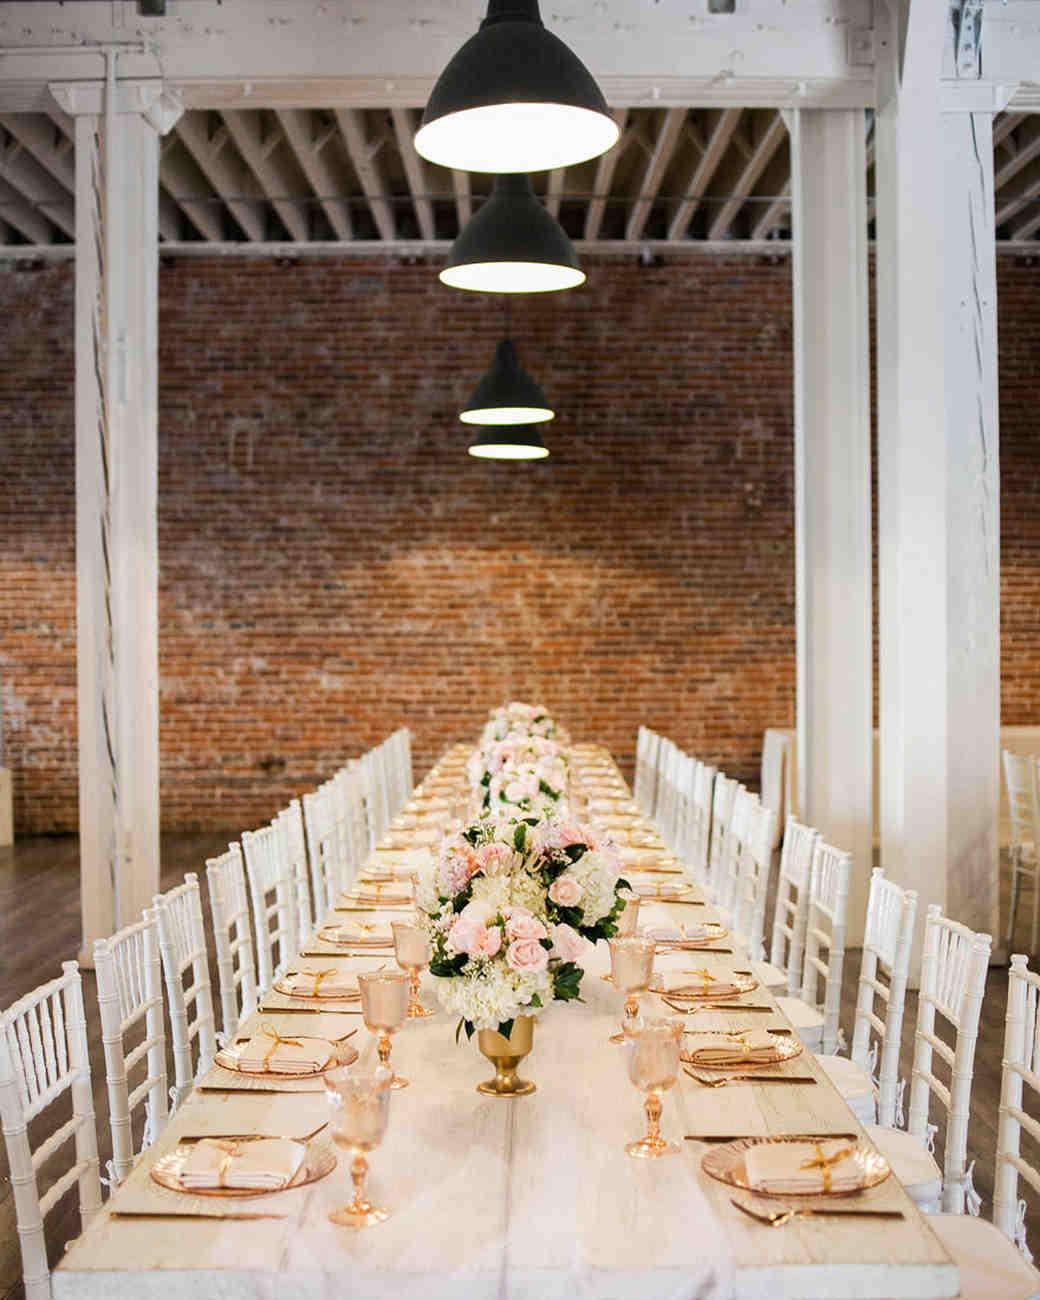 wedding-brunch-ideas-simple-table-scape-0416.jpg